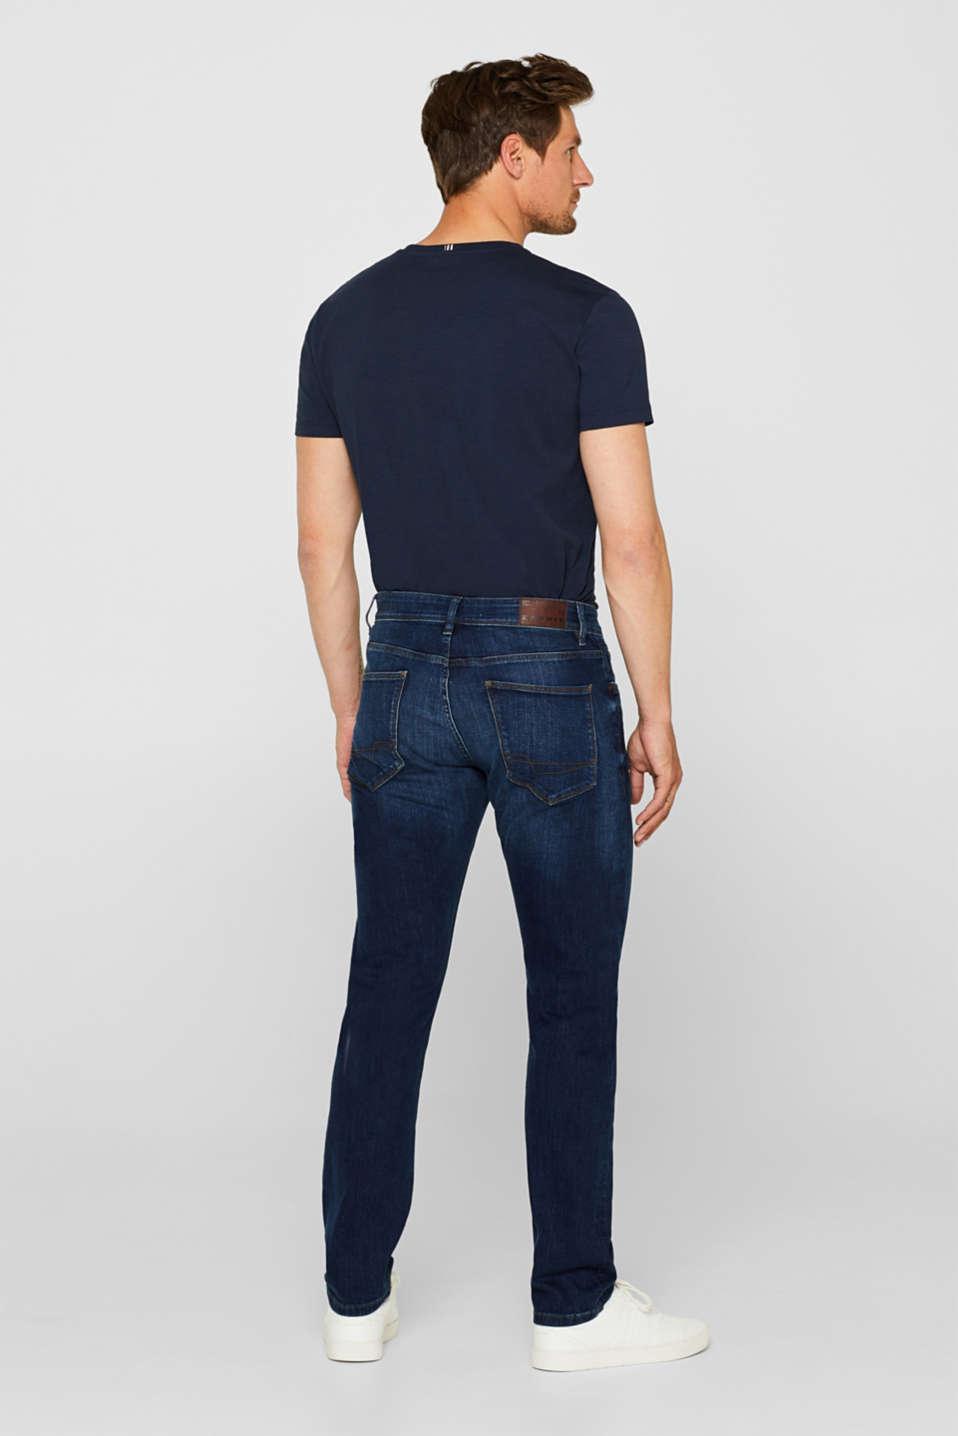 Pants denim, BLUE MEDIUM WASH, detail image number 1